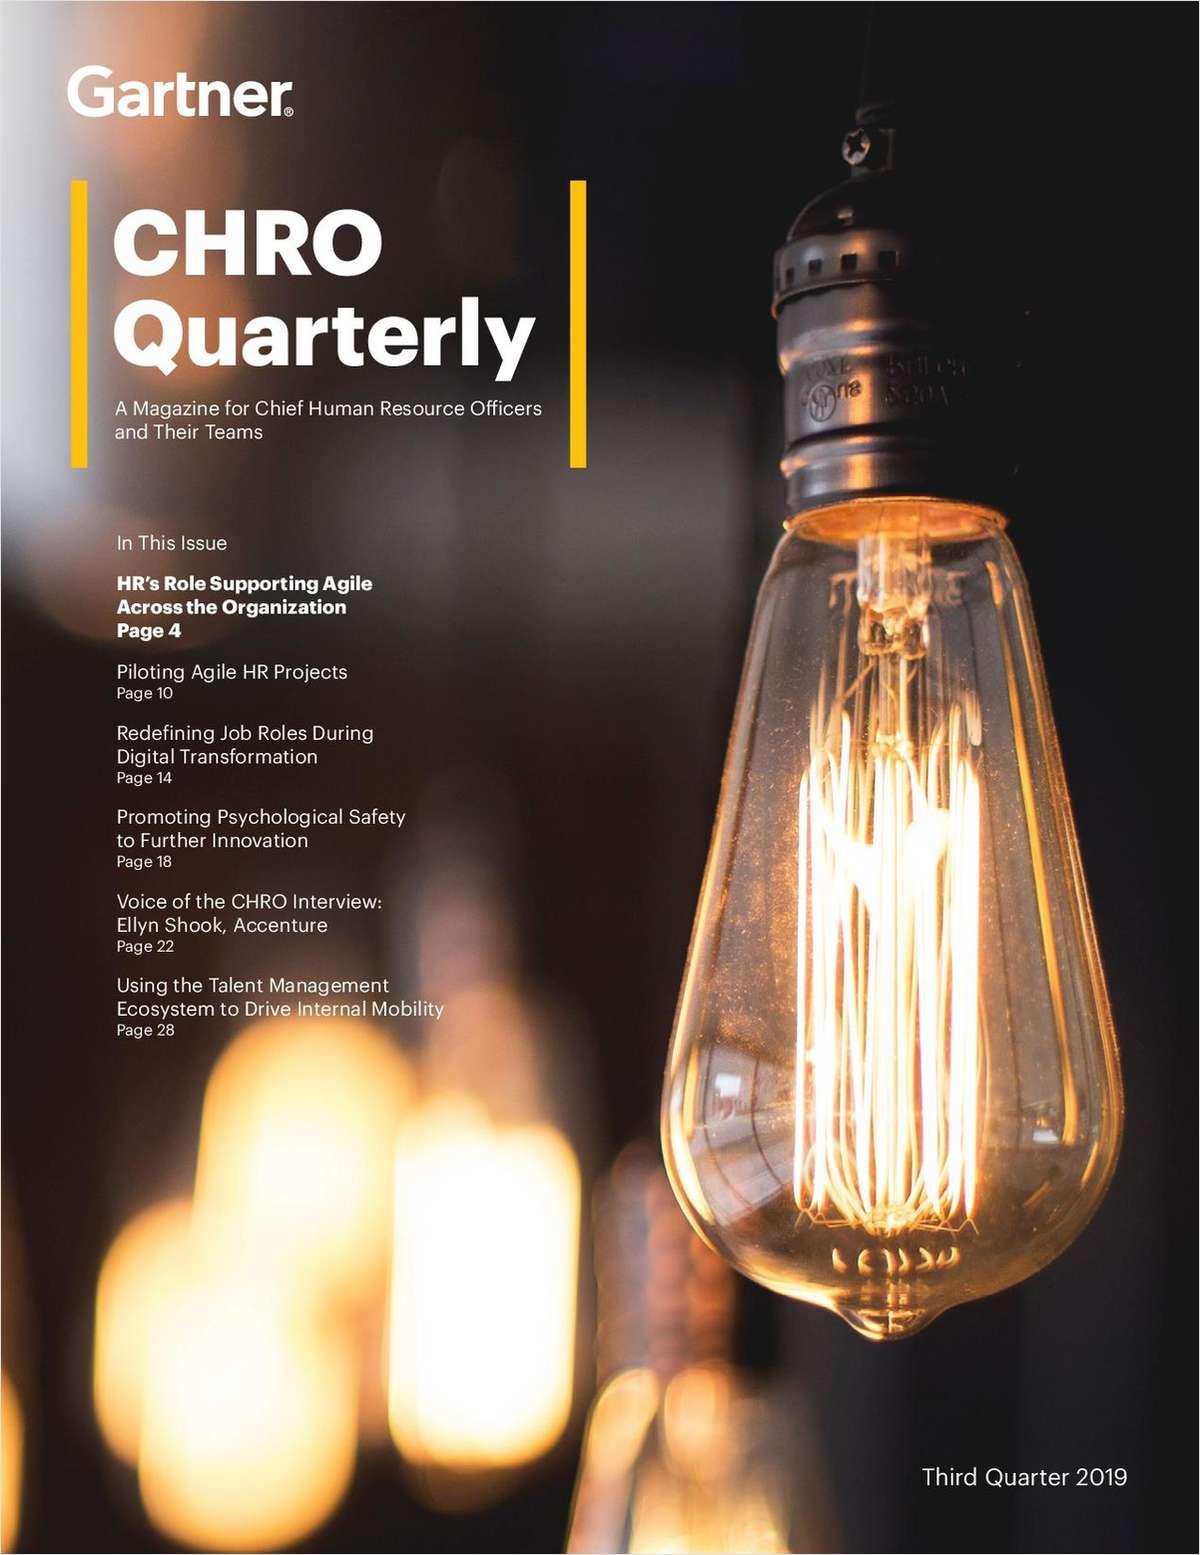 CHRO Quarterly - Implementing Innovation